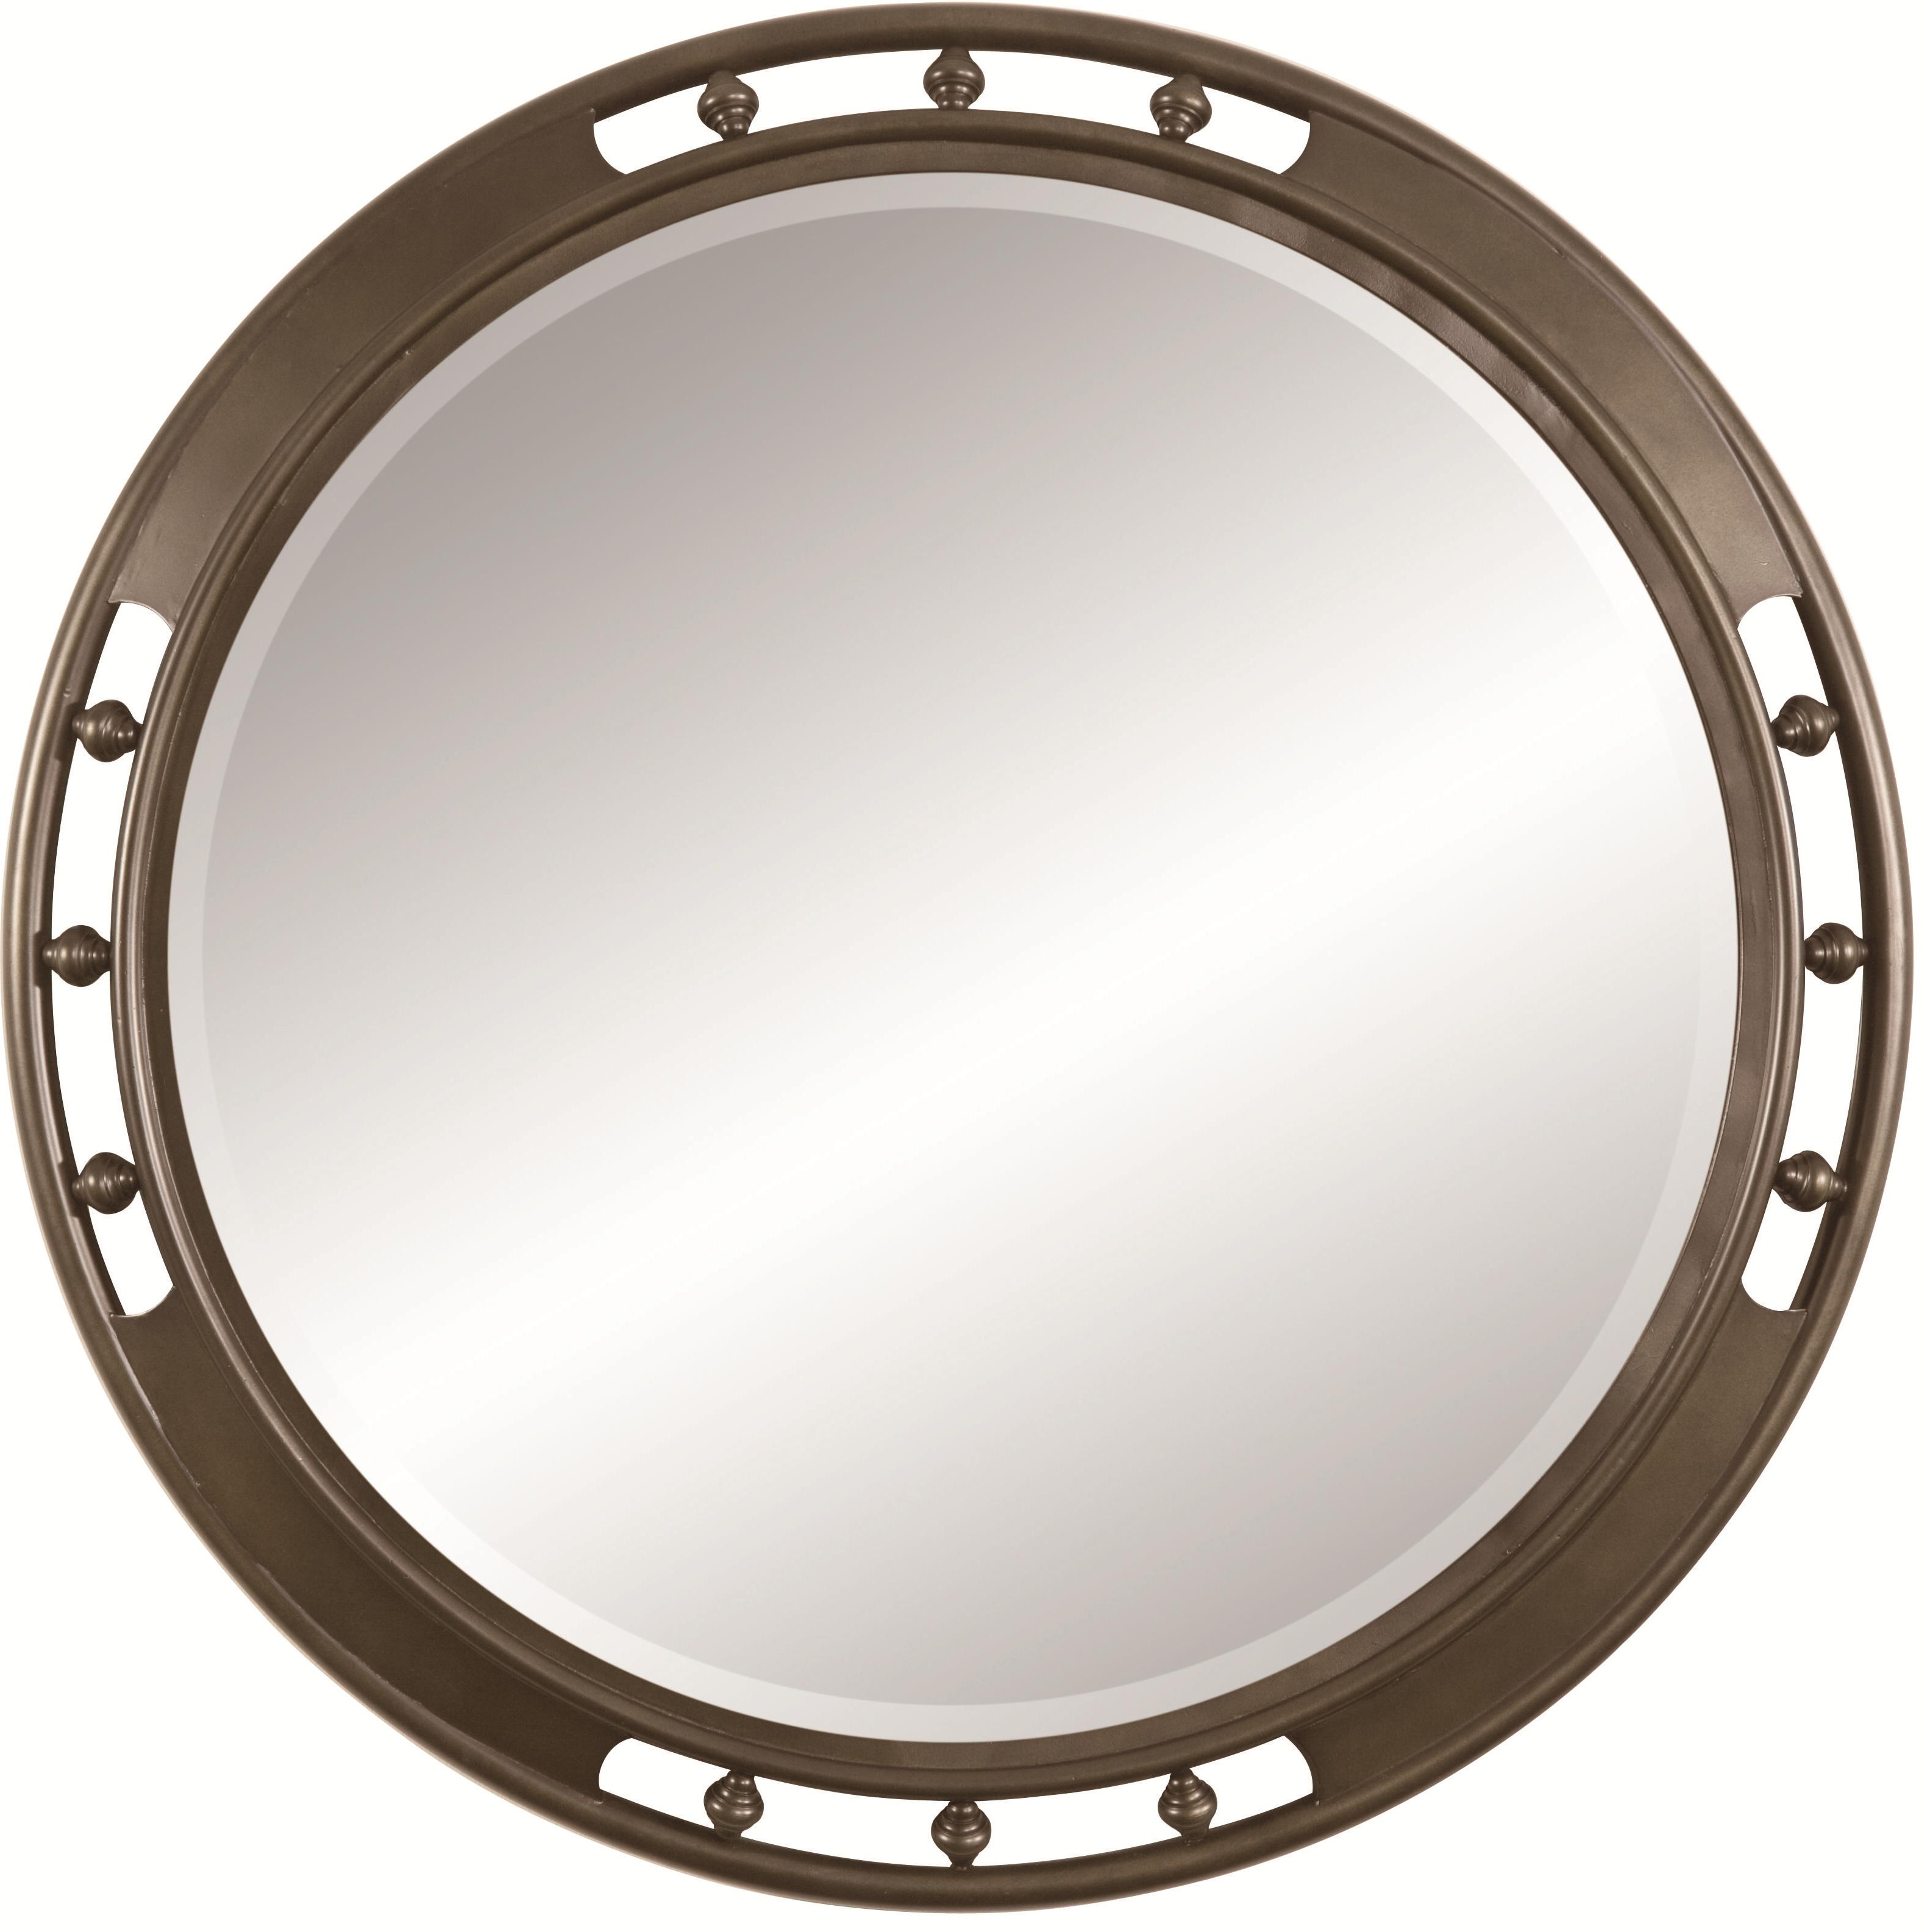 Thomasville® American Anthem Round Mirror - Item Number: 82891-257